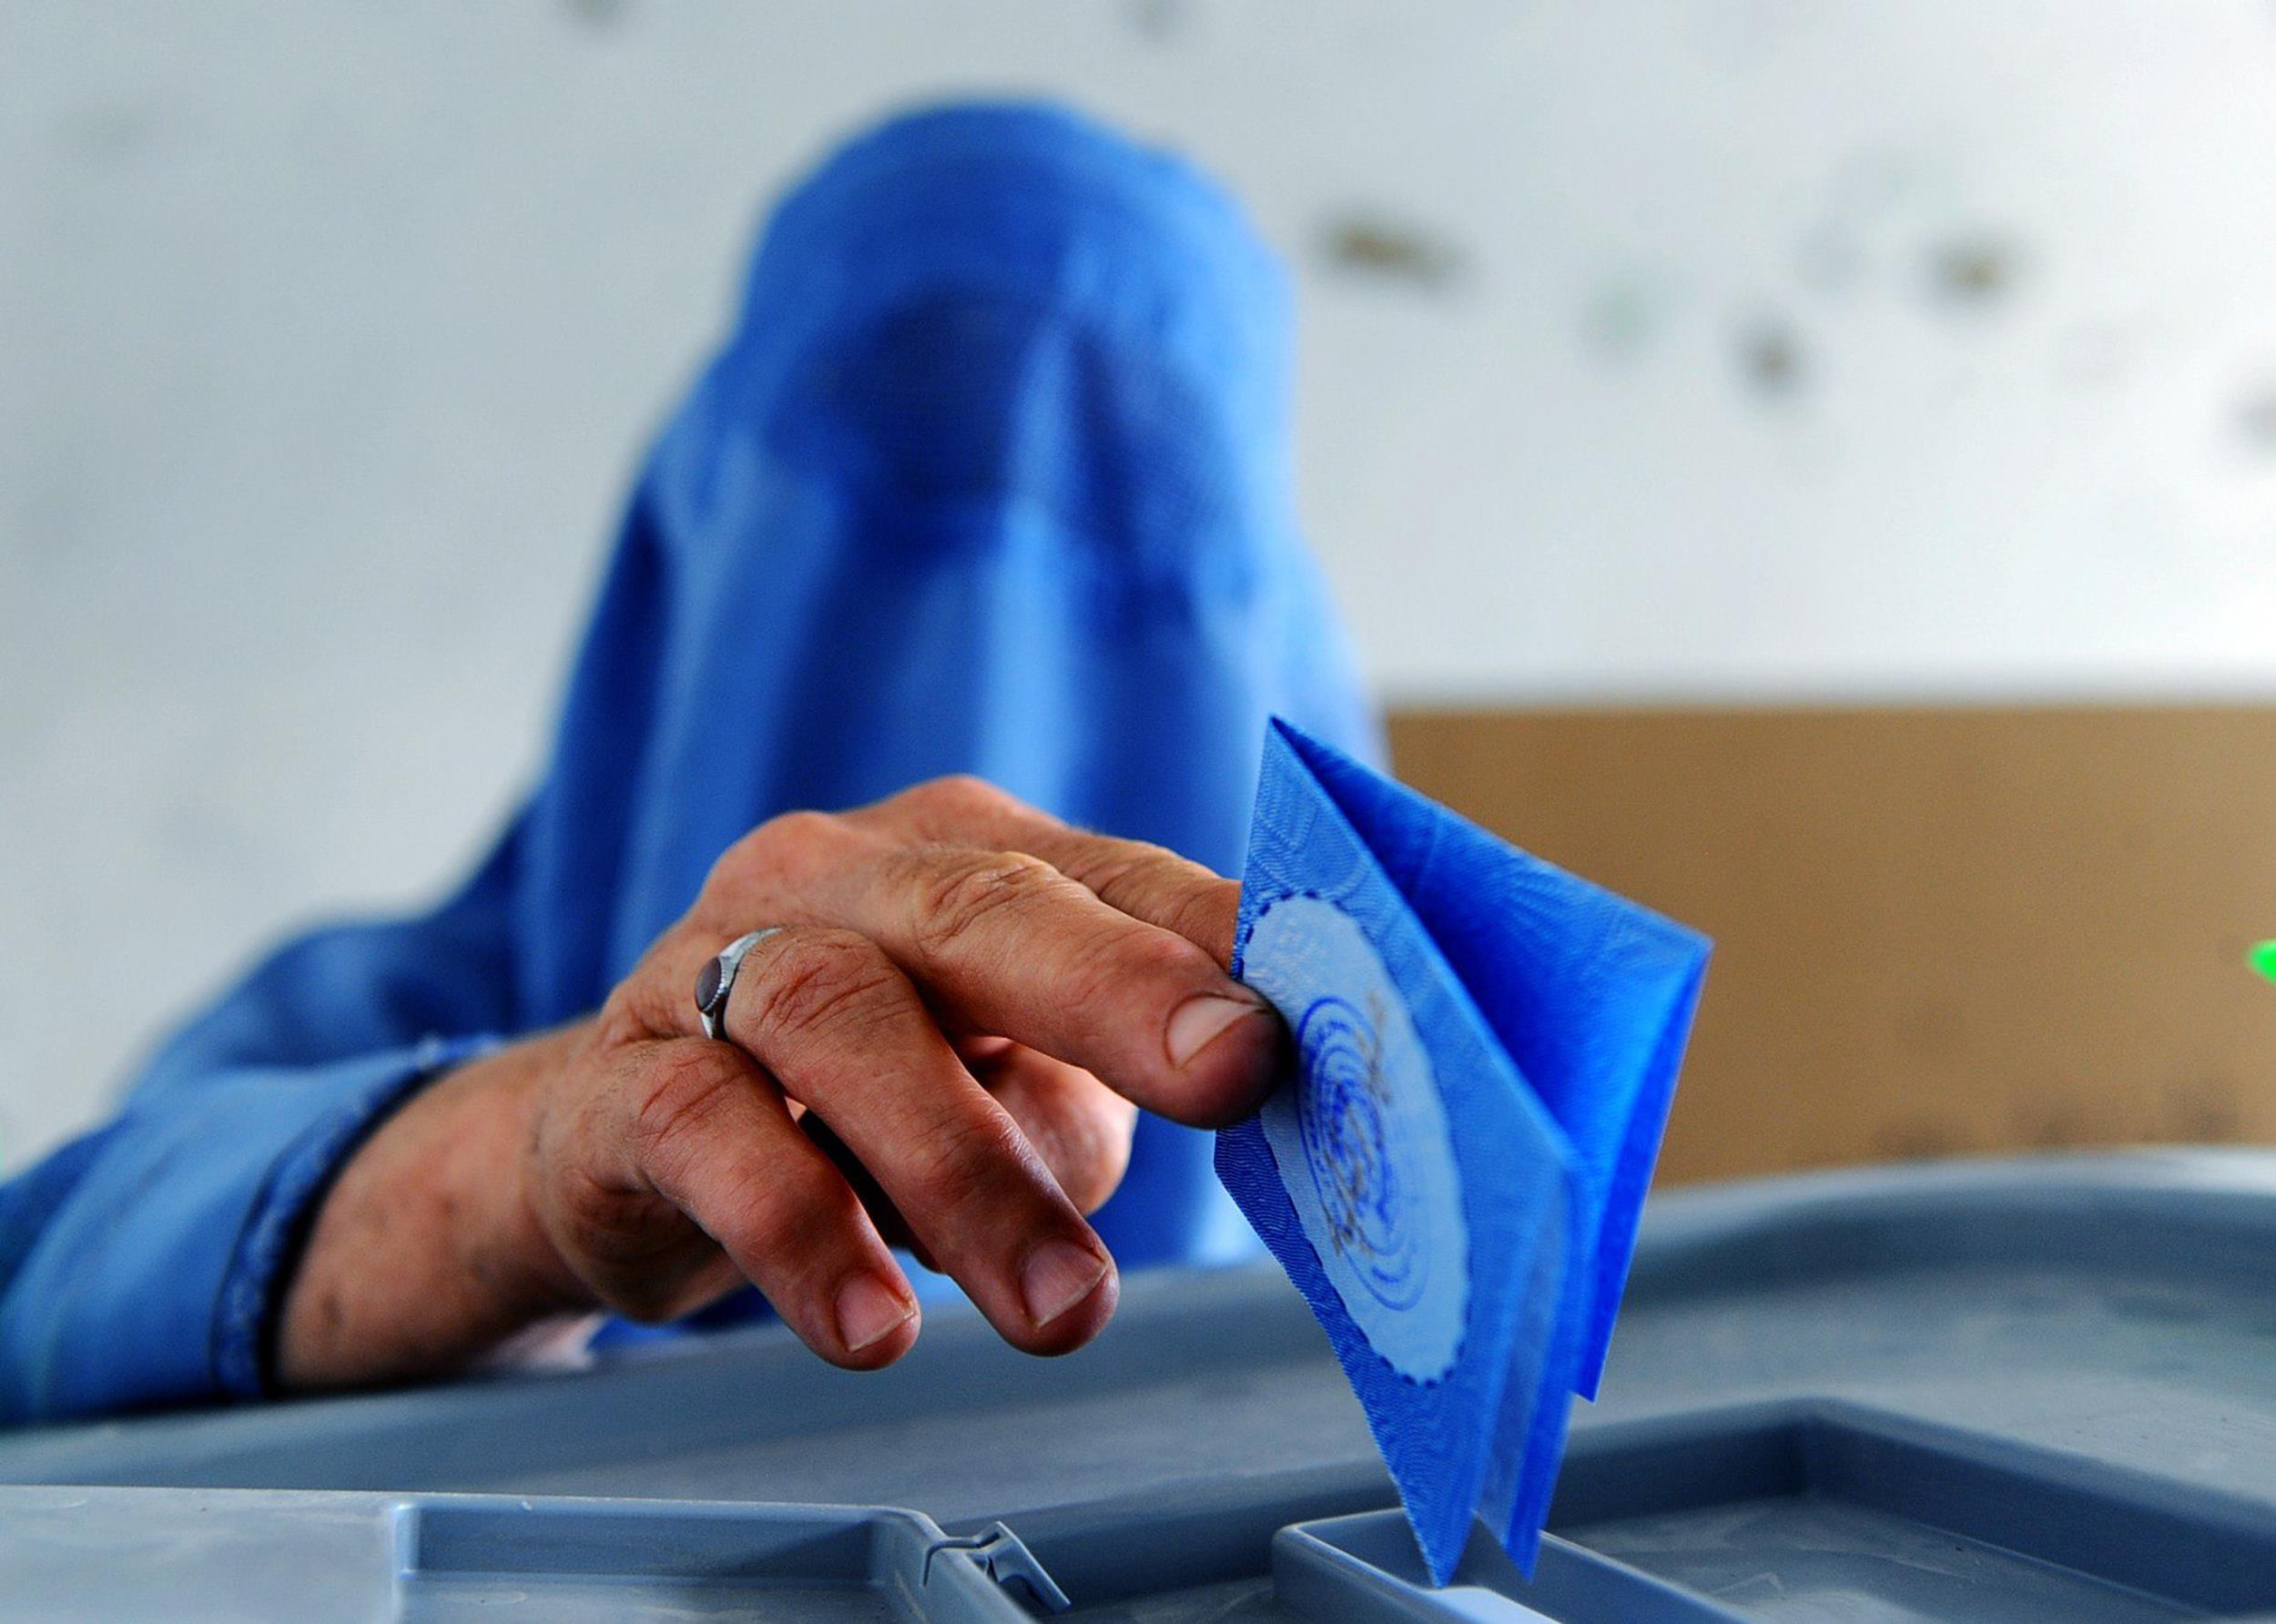 Image: AFGHANISTAN-ELECTION